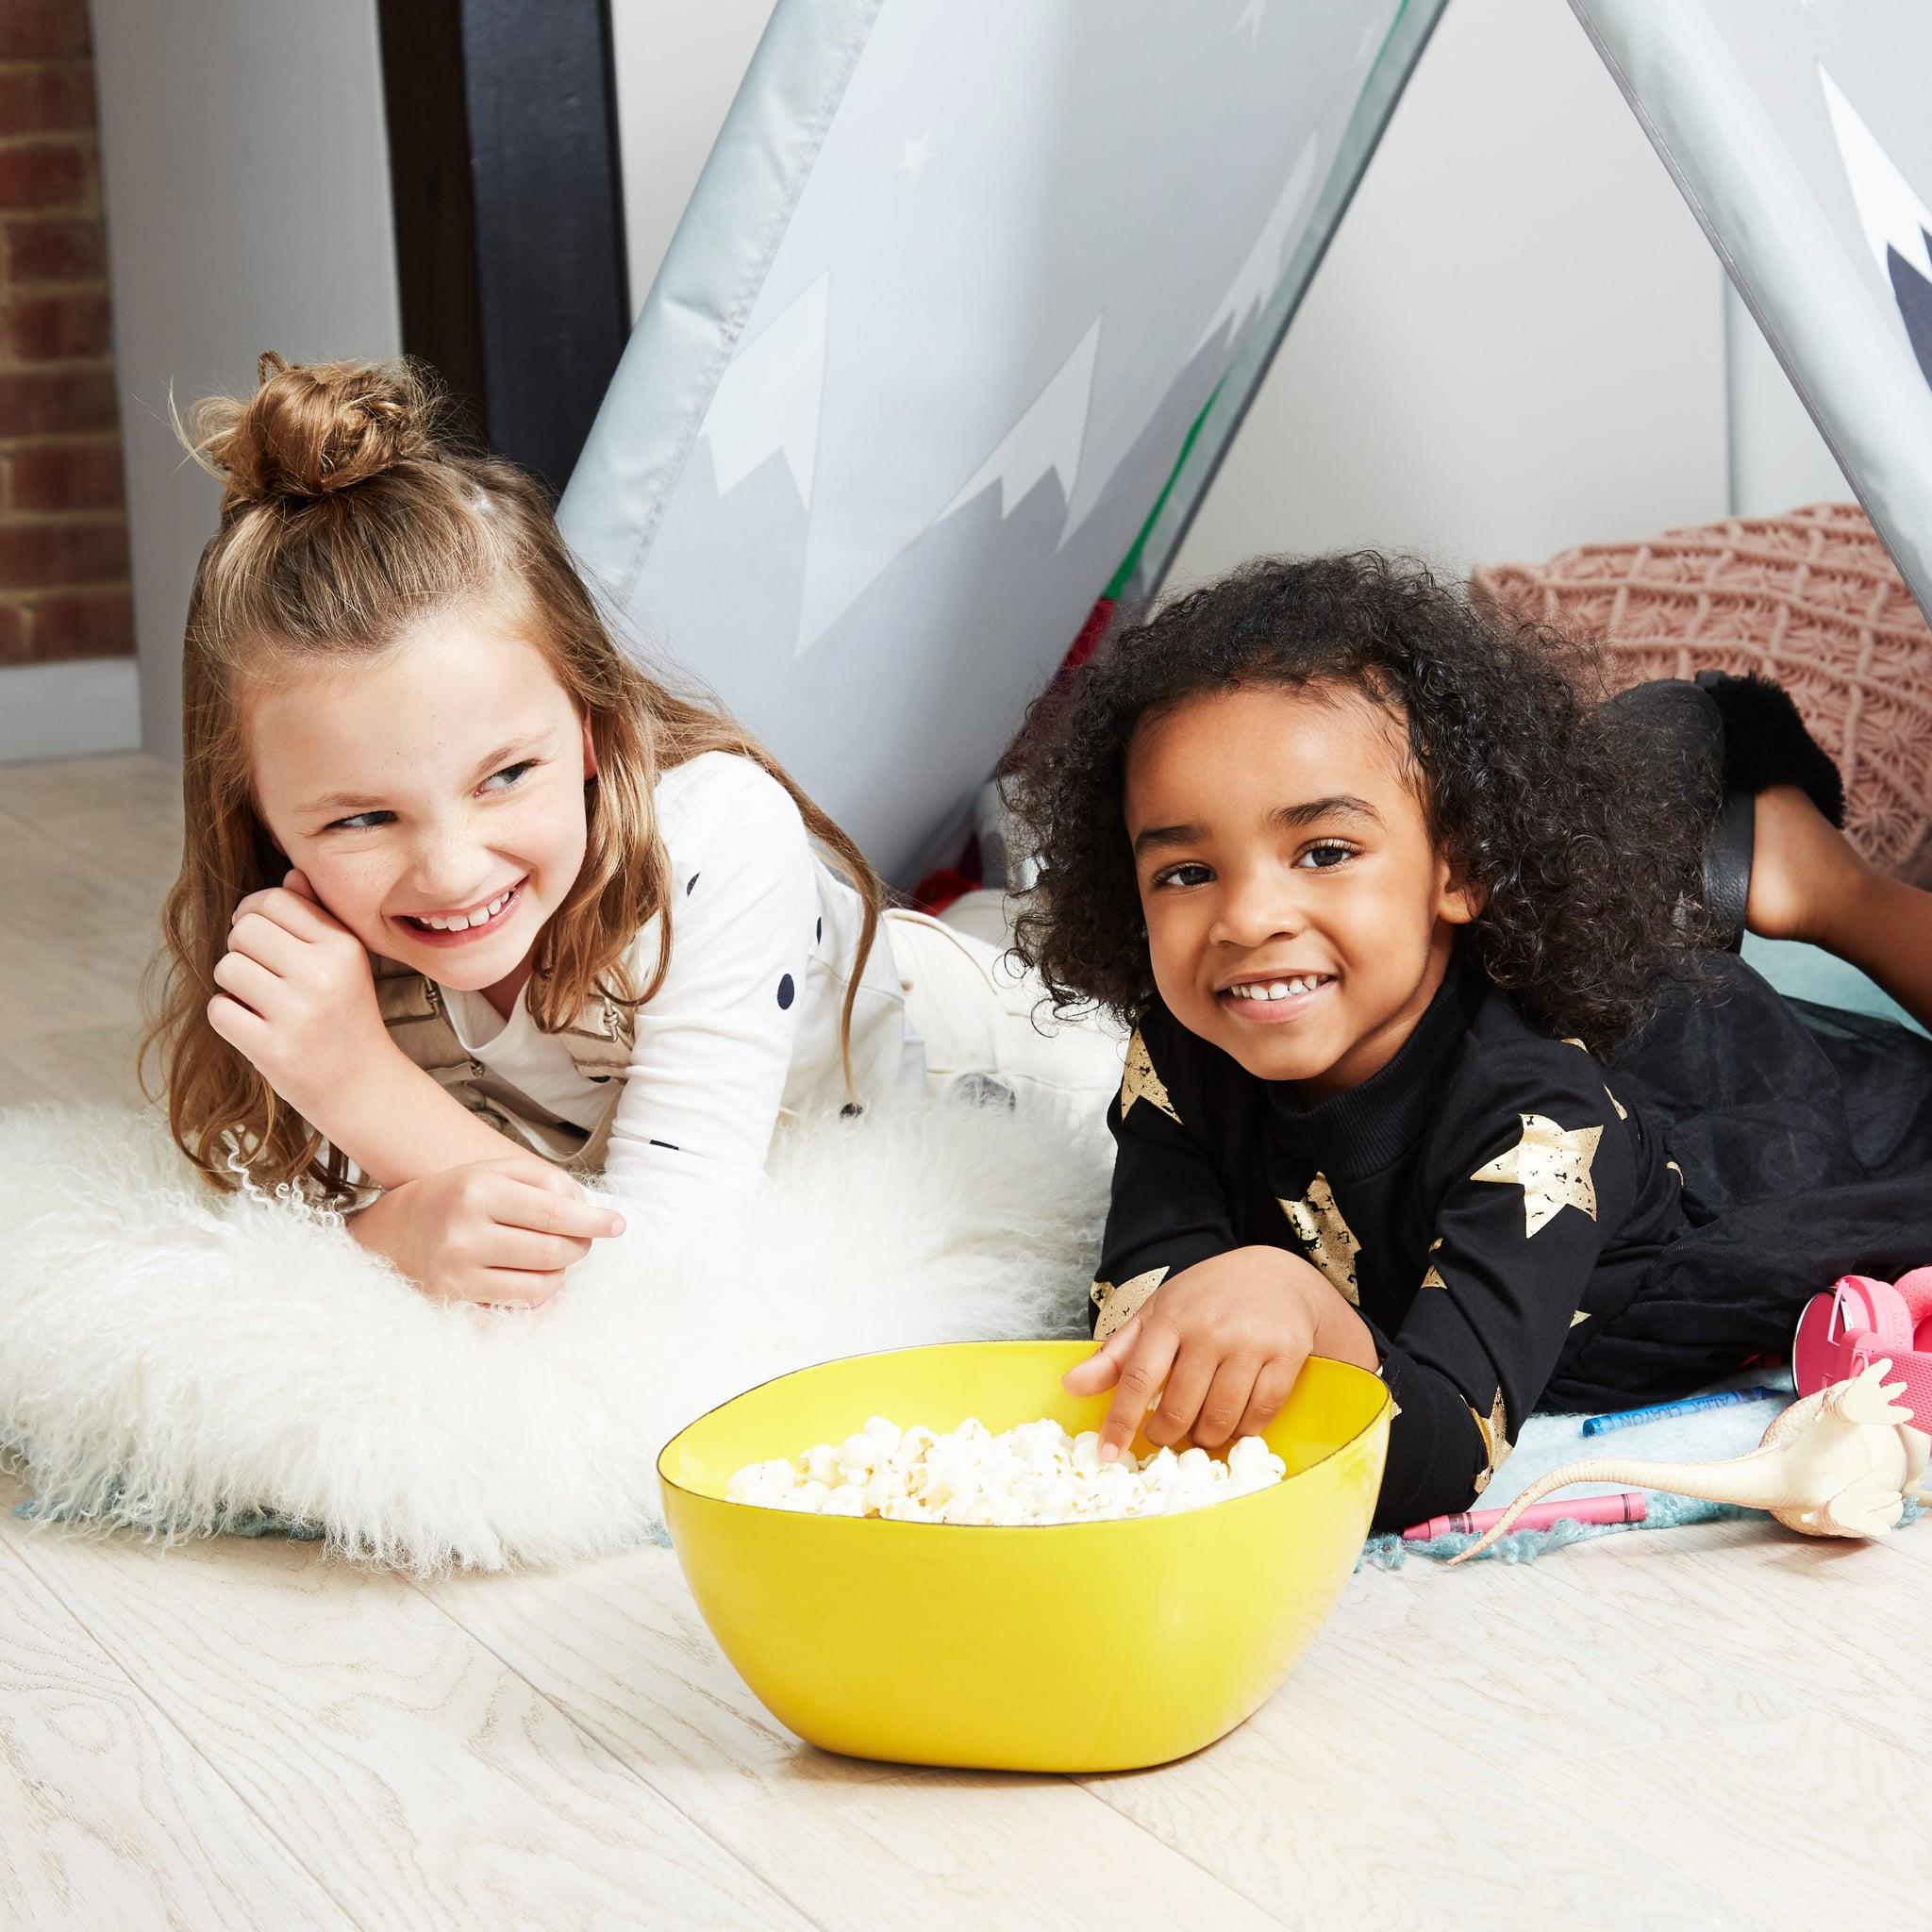 afb9259da Kohls Holiday Dresses Toddlers – DACC